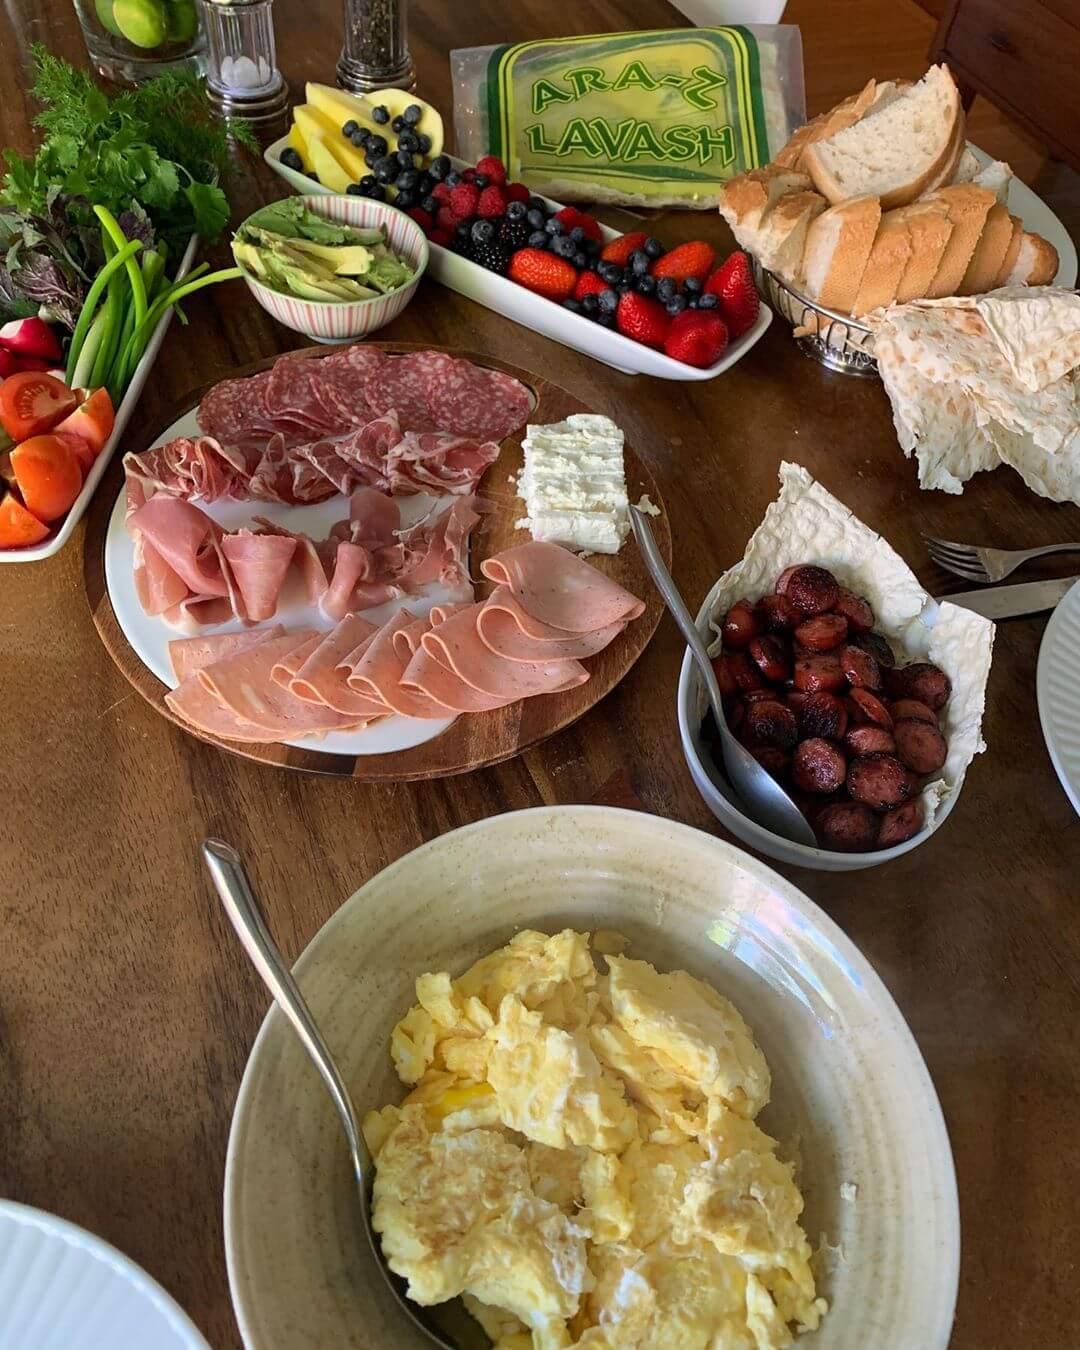 araz-lavash-breadmasters-armenian-breakfast-spread(1)